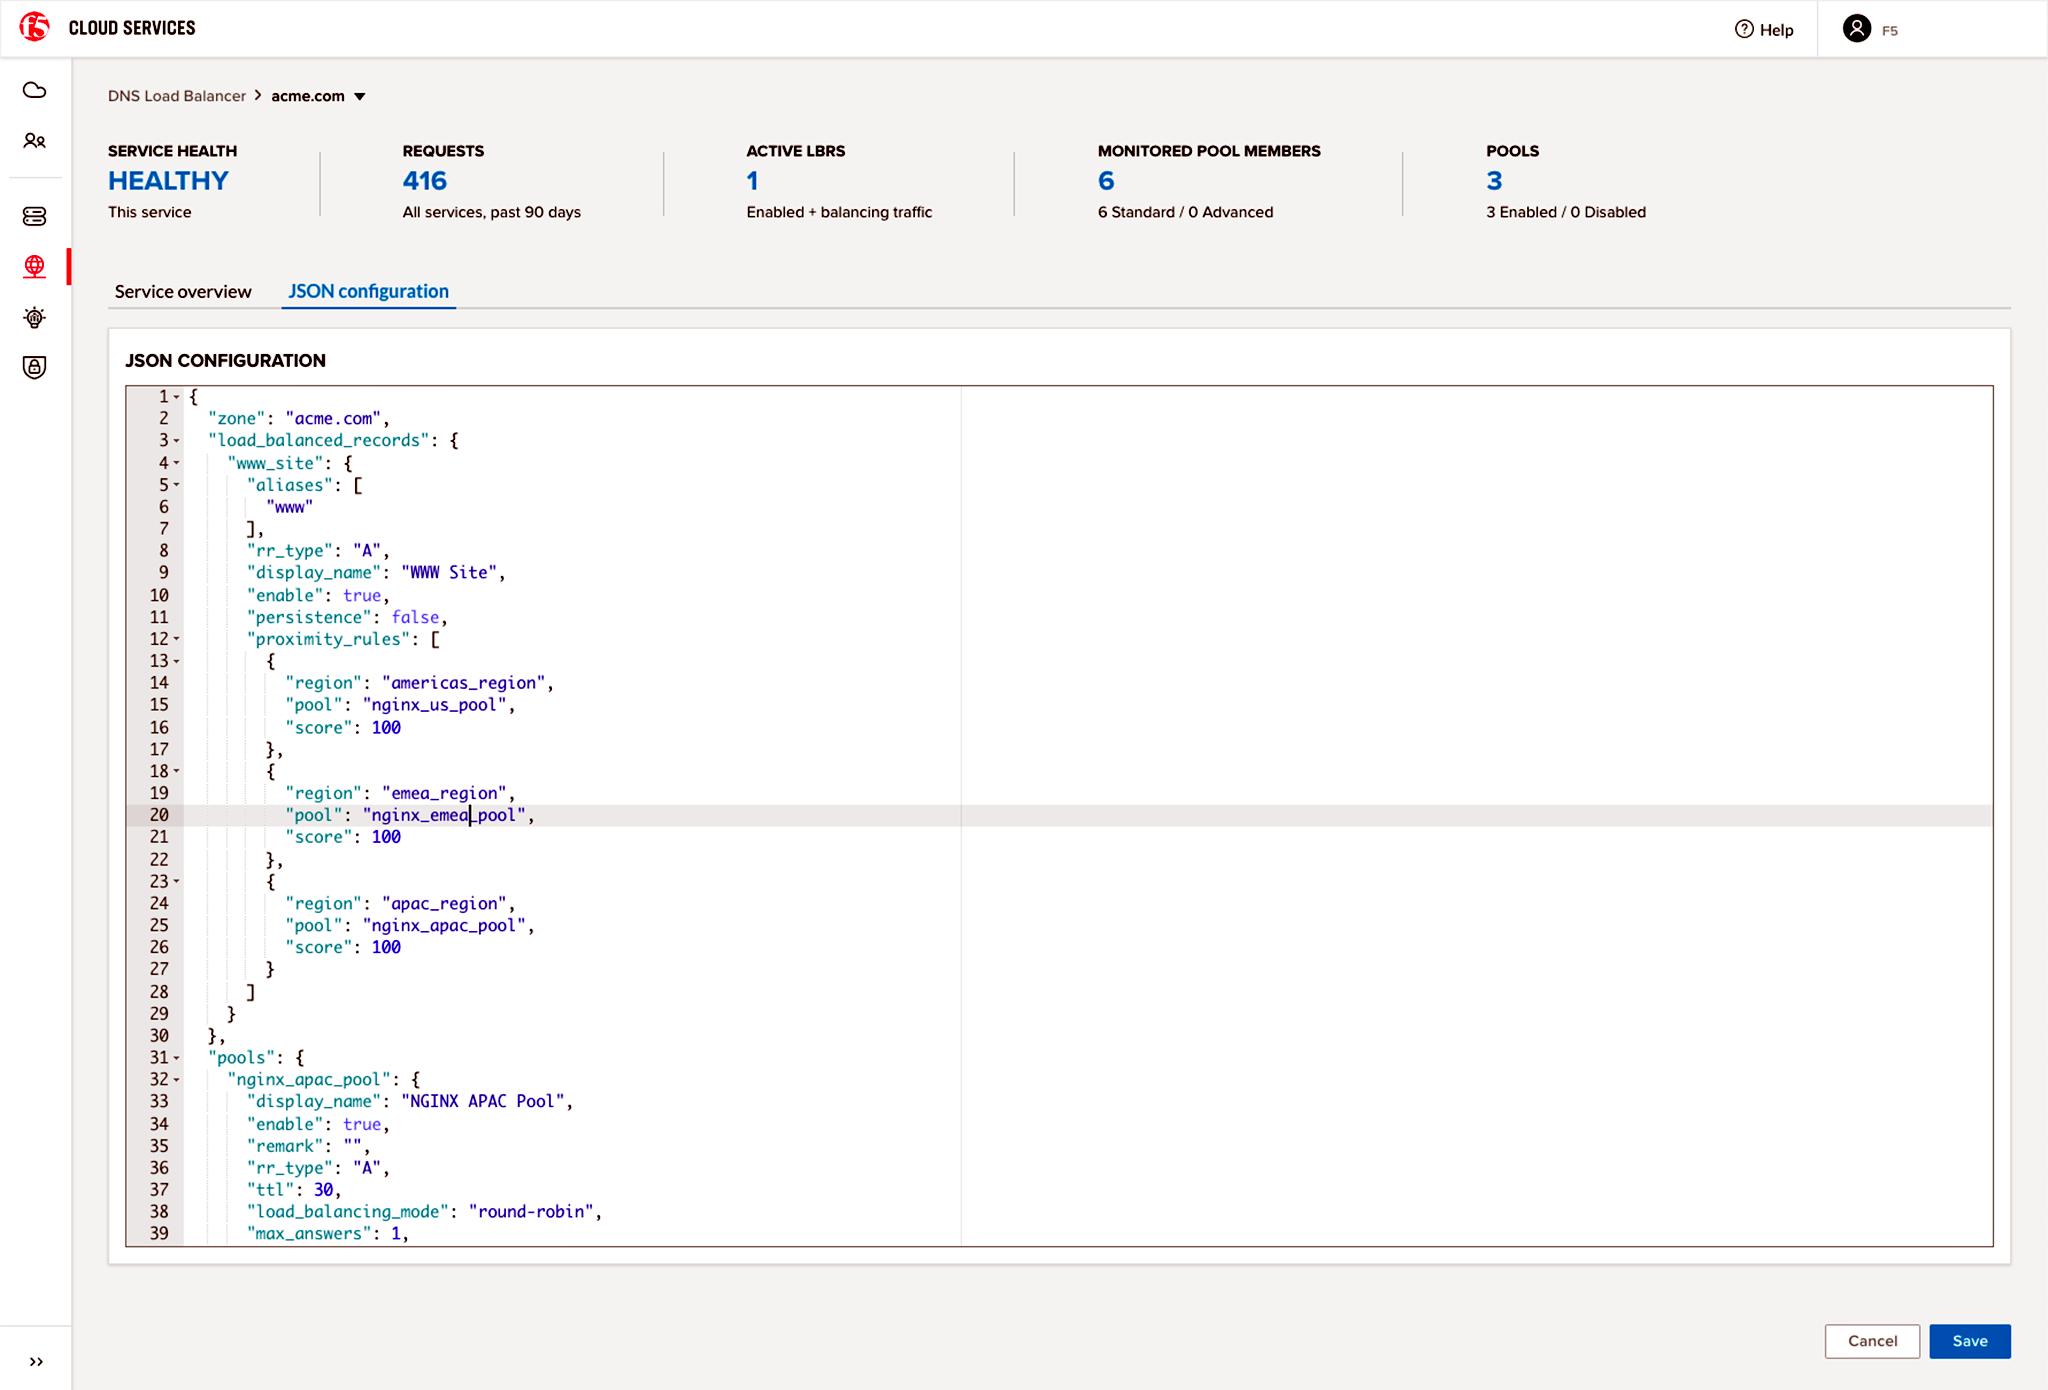 F5 Screenshot of JSON Configuration